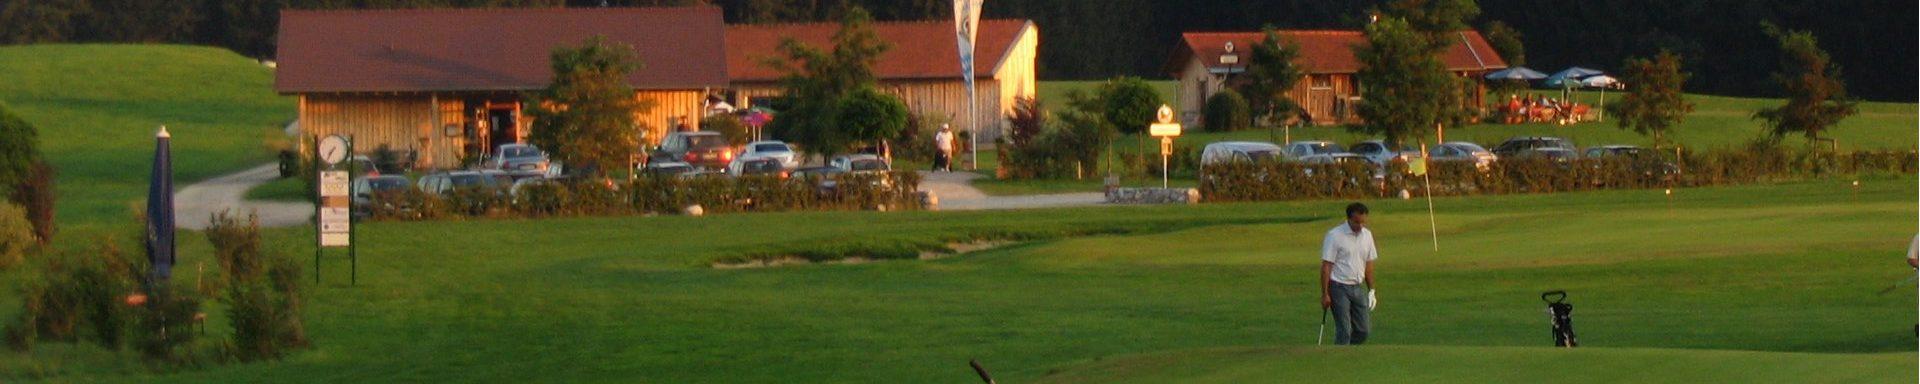 Zehentmayrhof - Aktiv Urlaub im Chiemgau